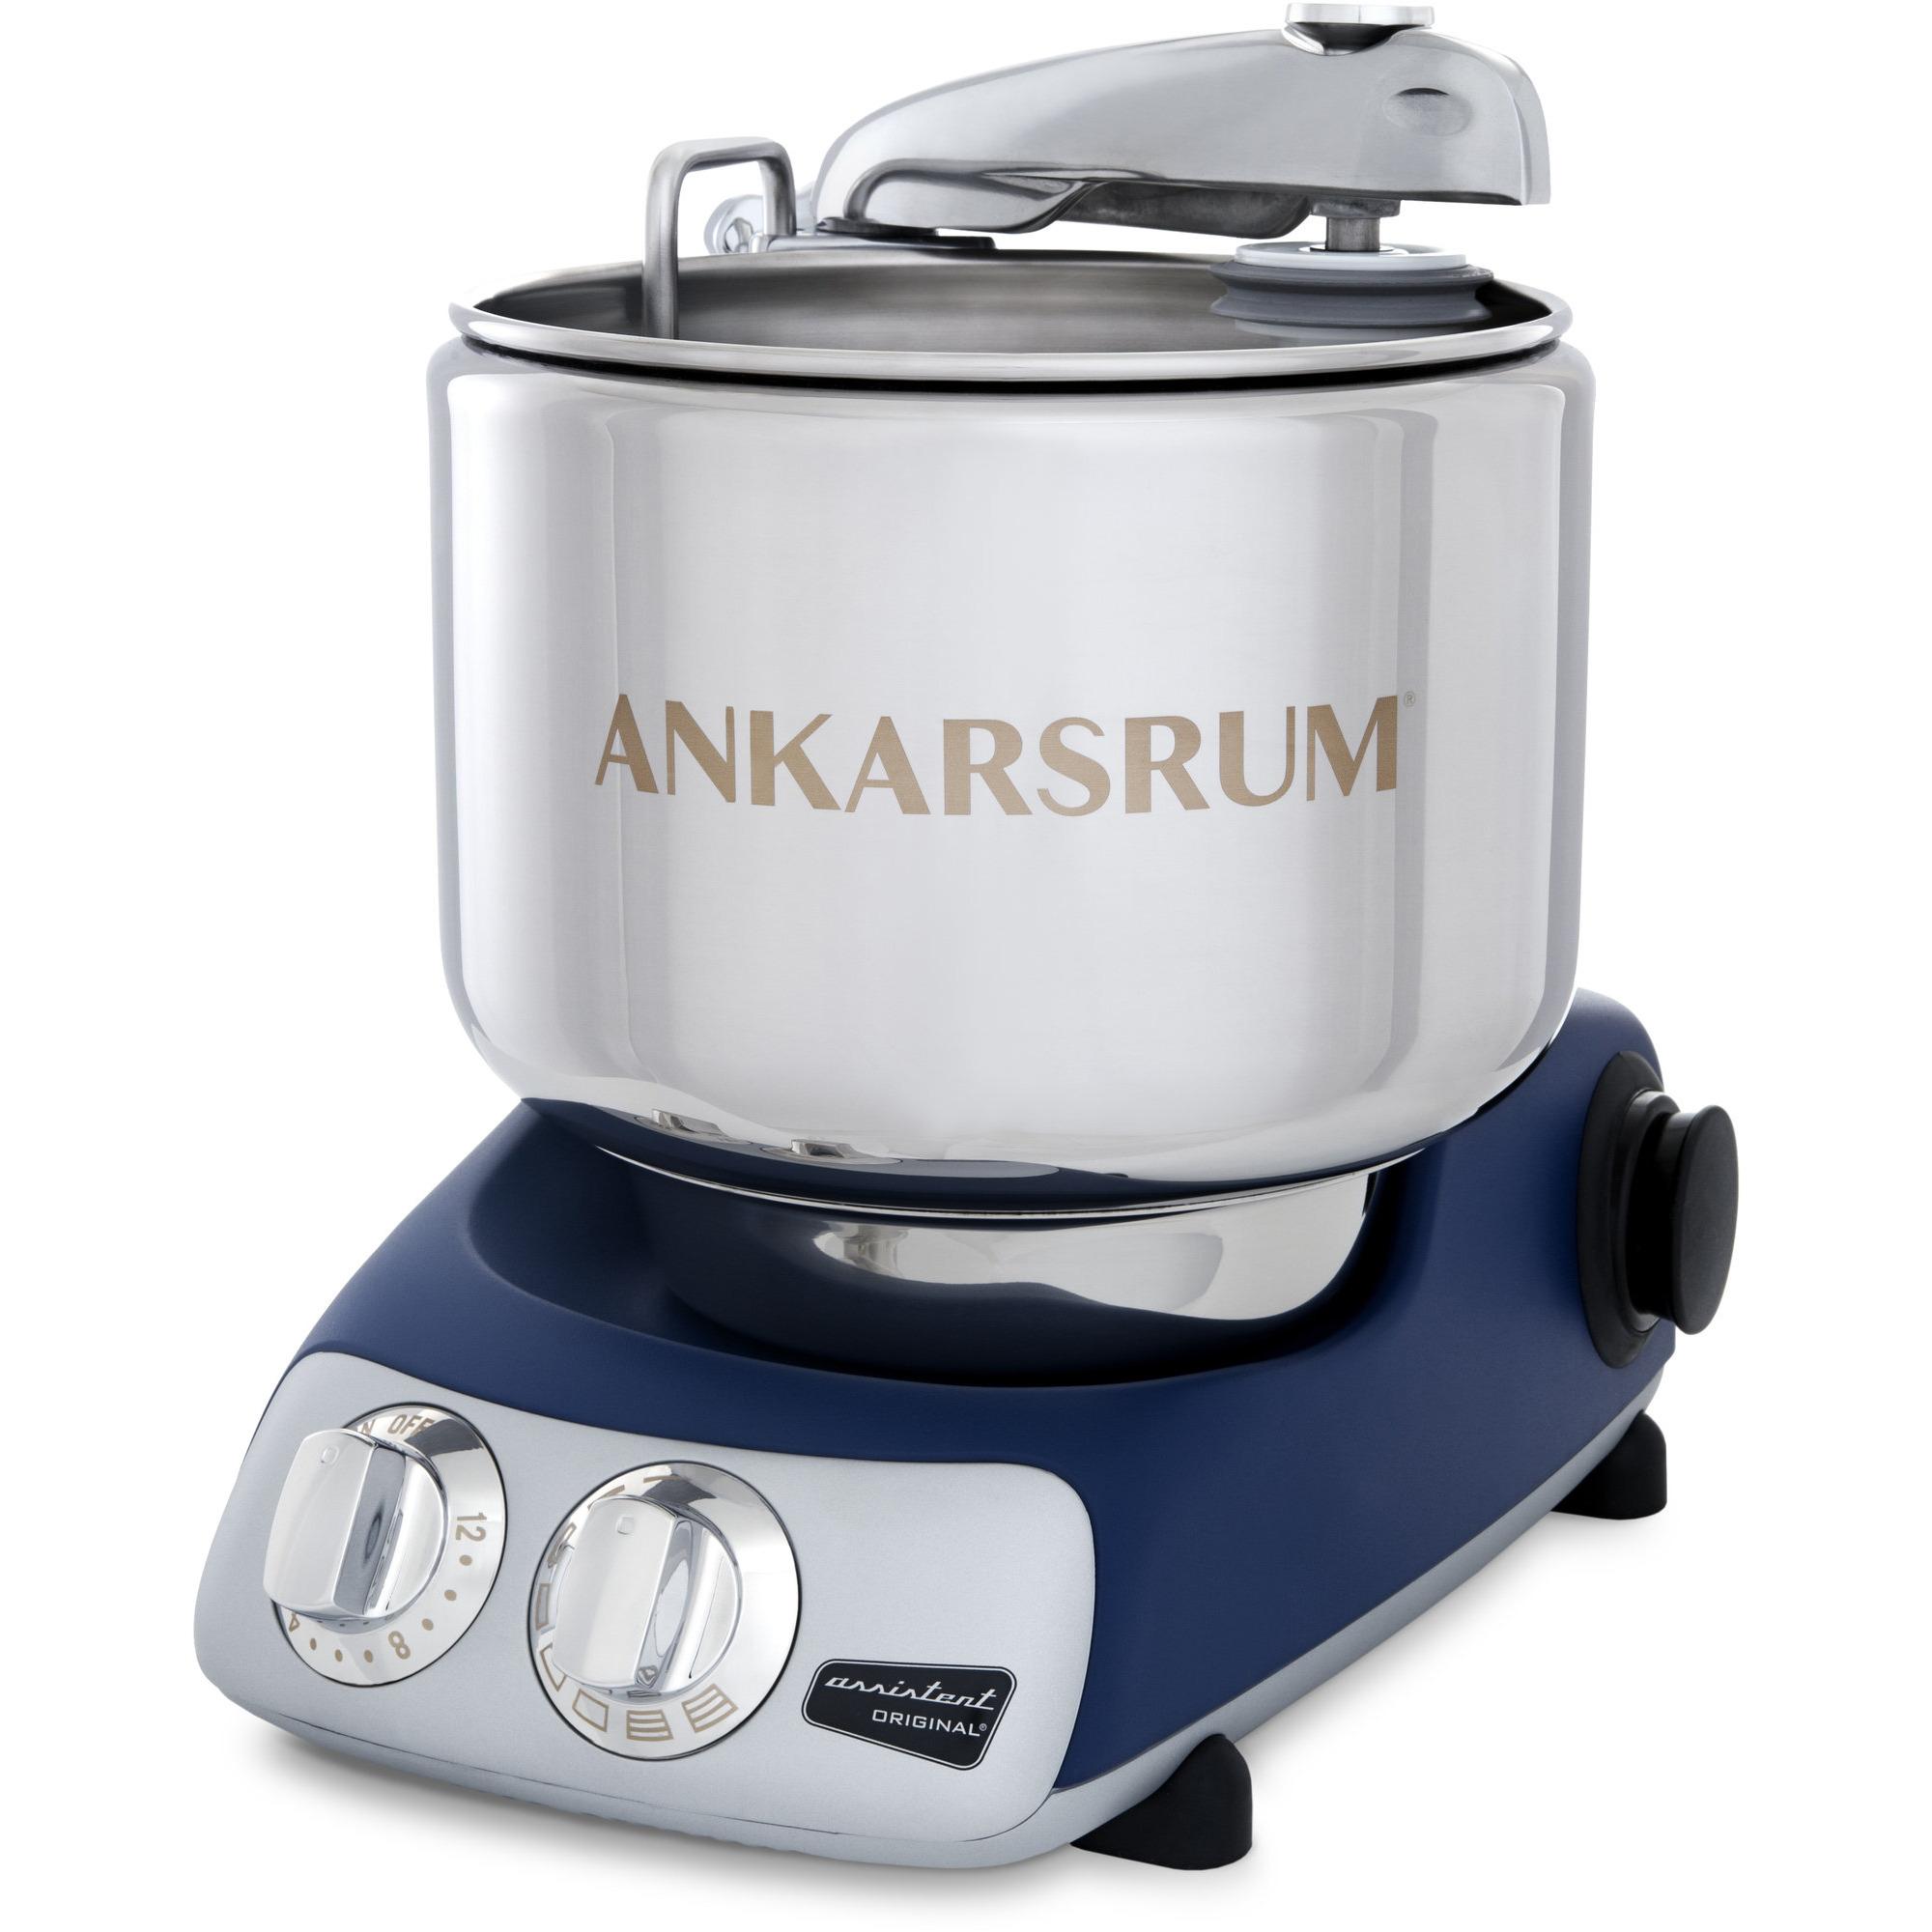 Bilde av Ankarsrum Assistent Original Akm6230rb Royalblå